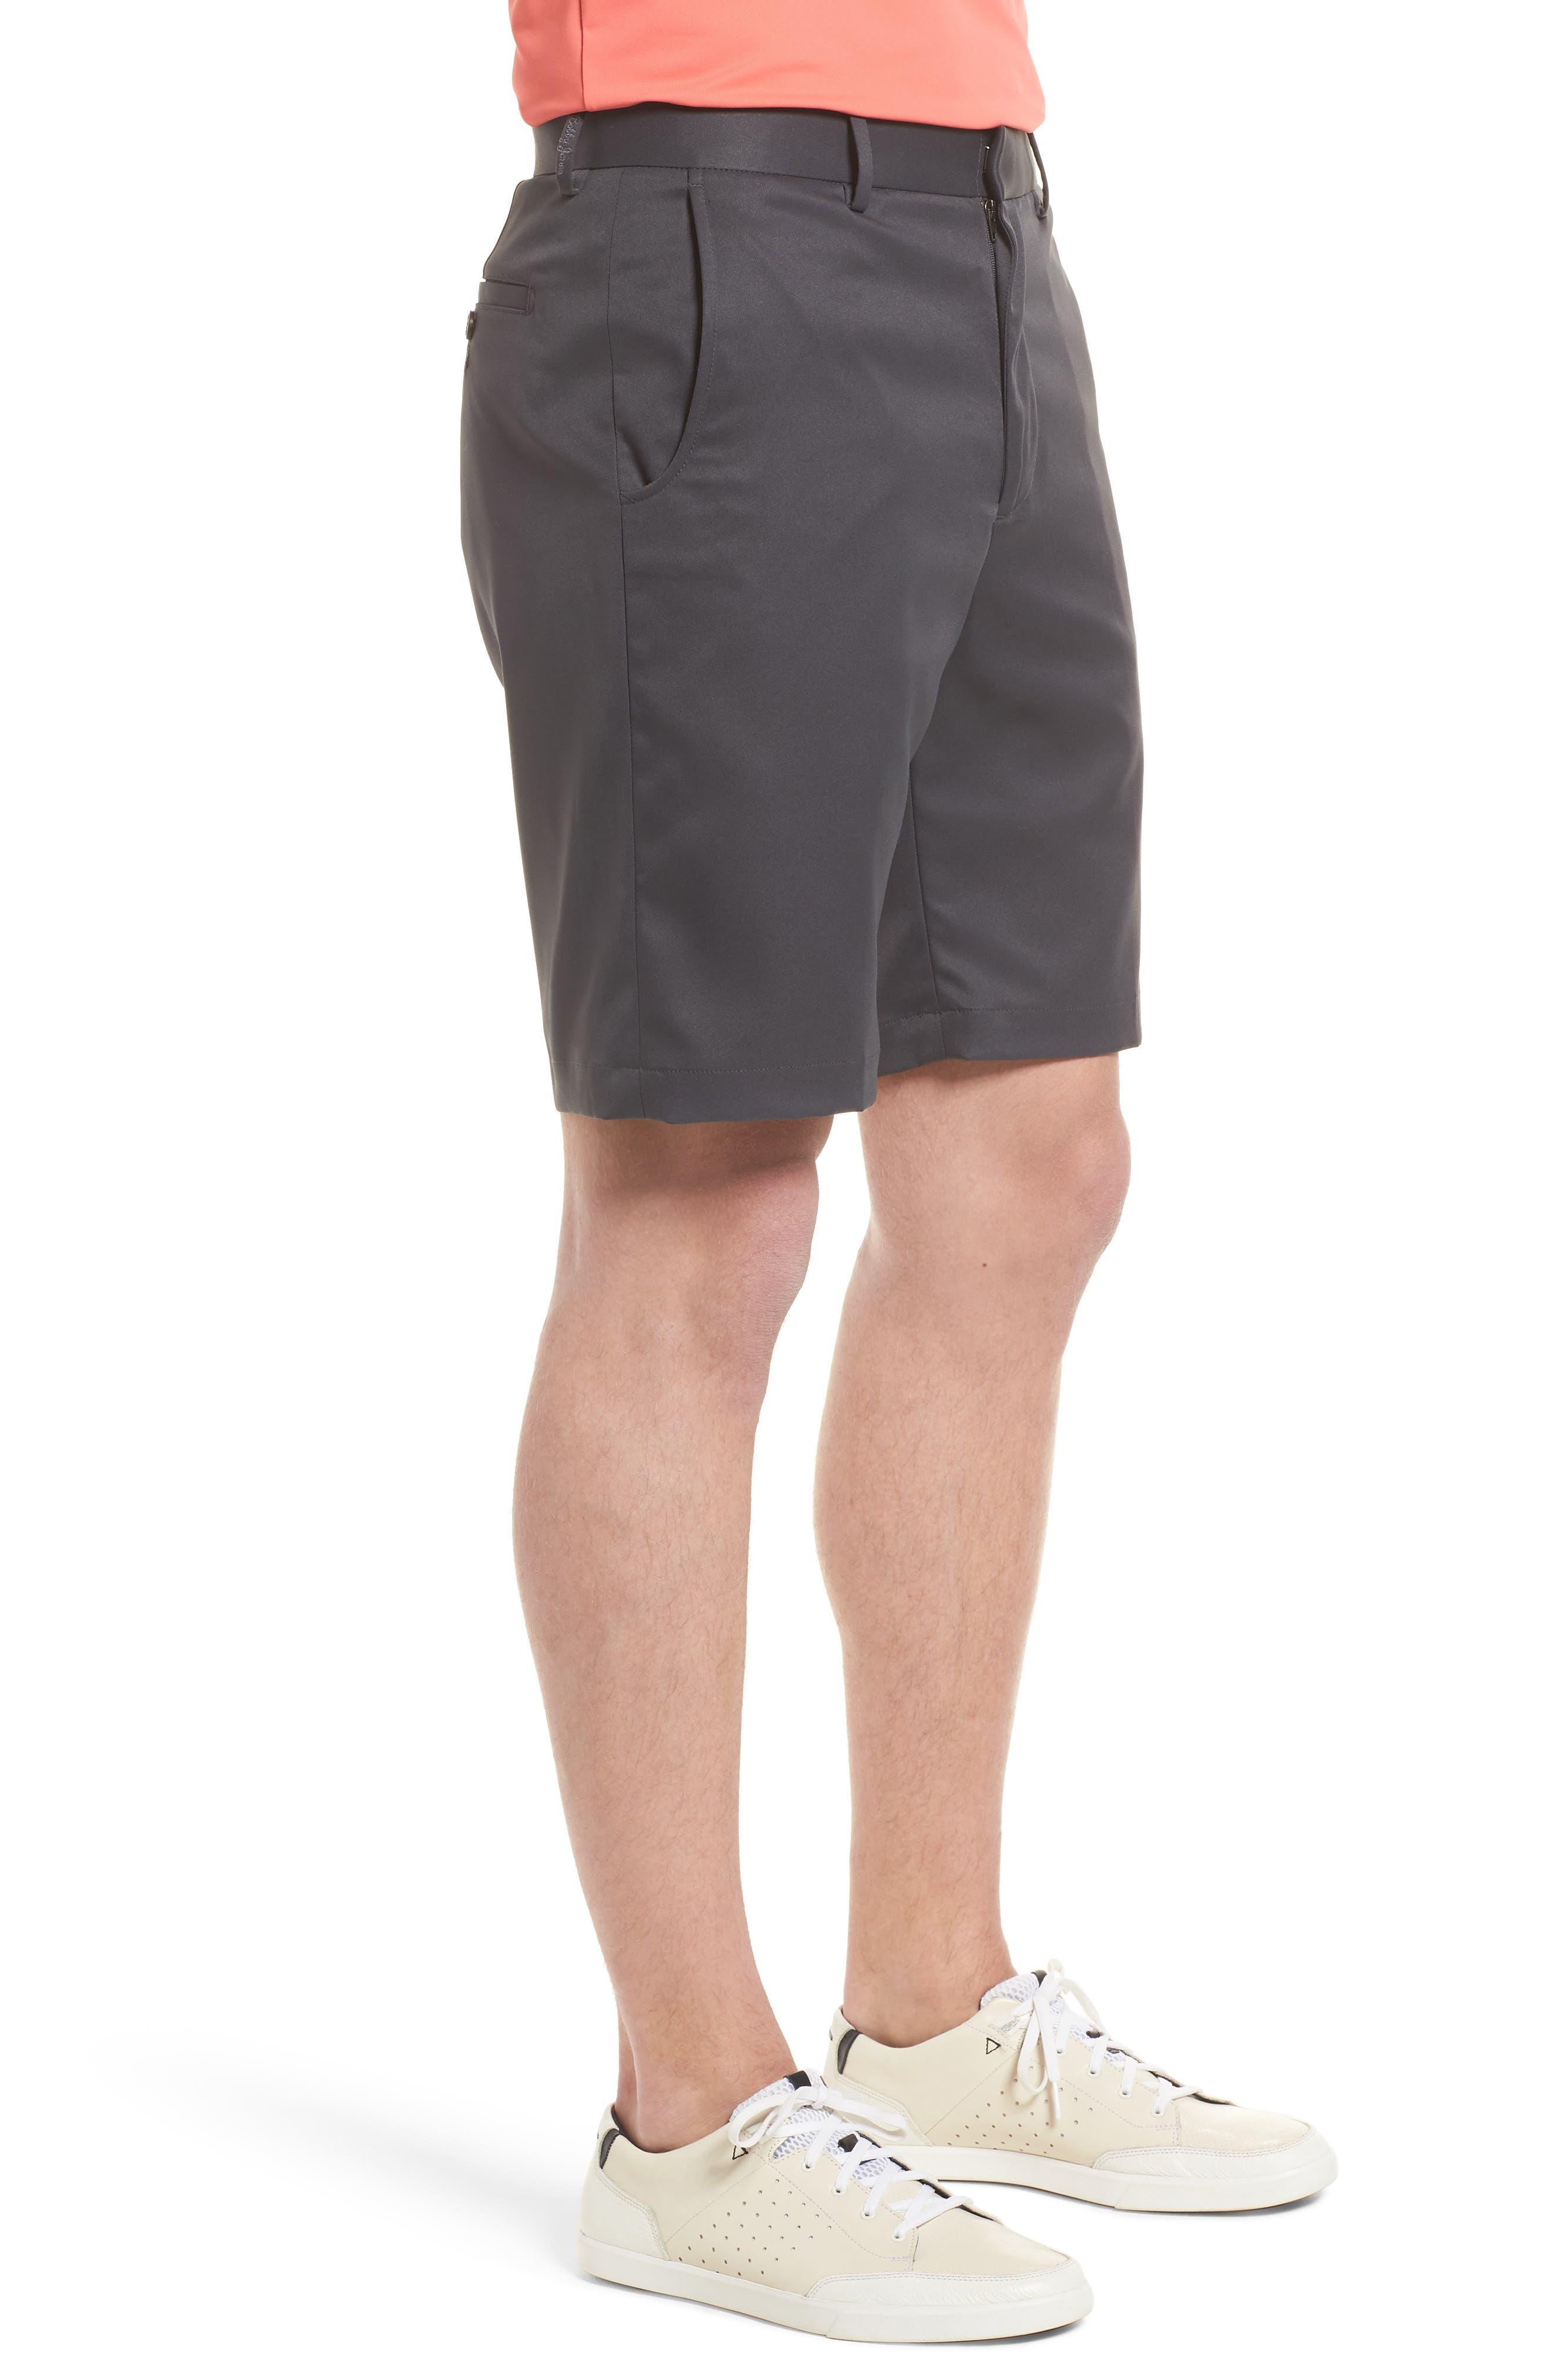 BOBBY JONES, Flat Front Tech Shorts, Alternate thumbnail 3, color, CHARCOAL